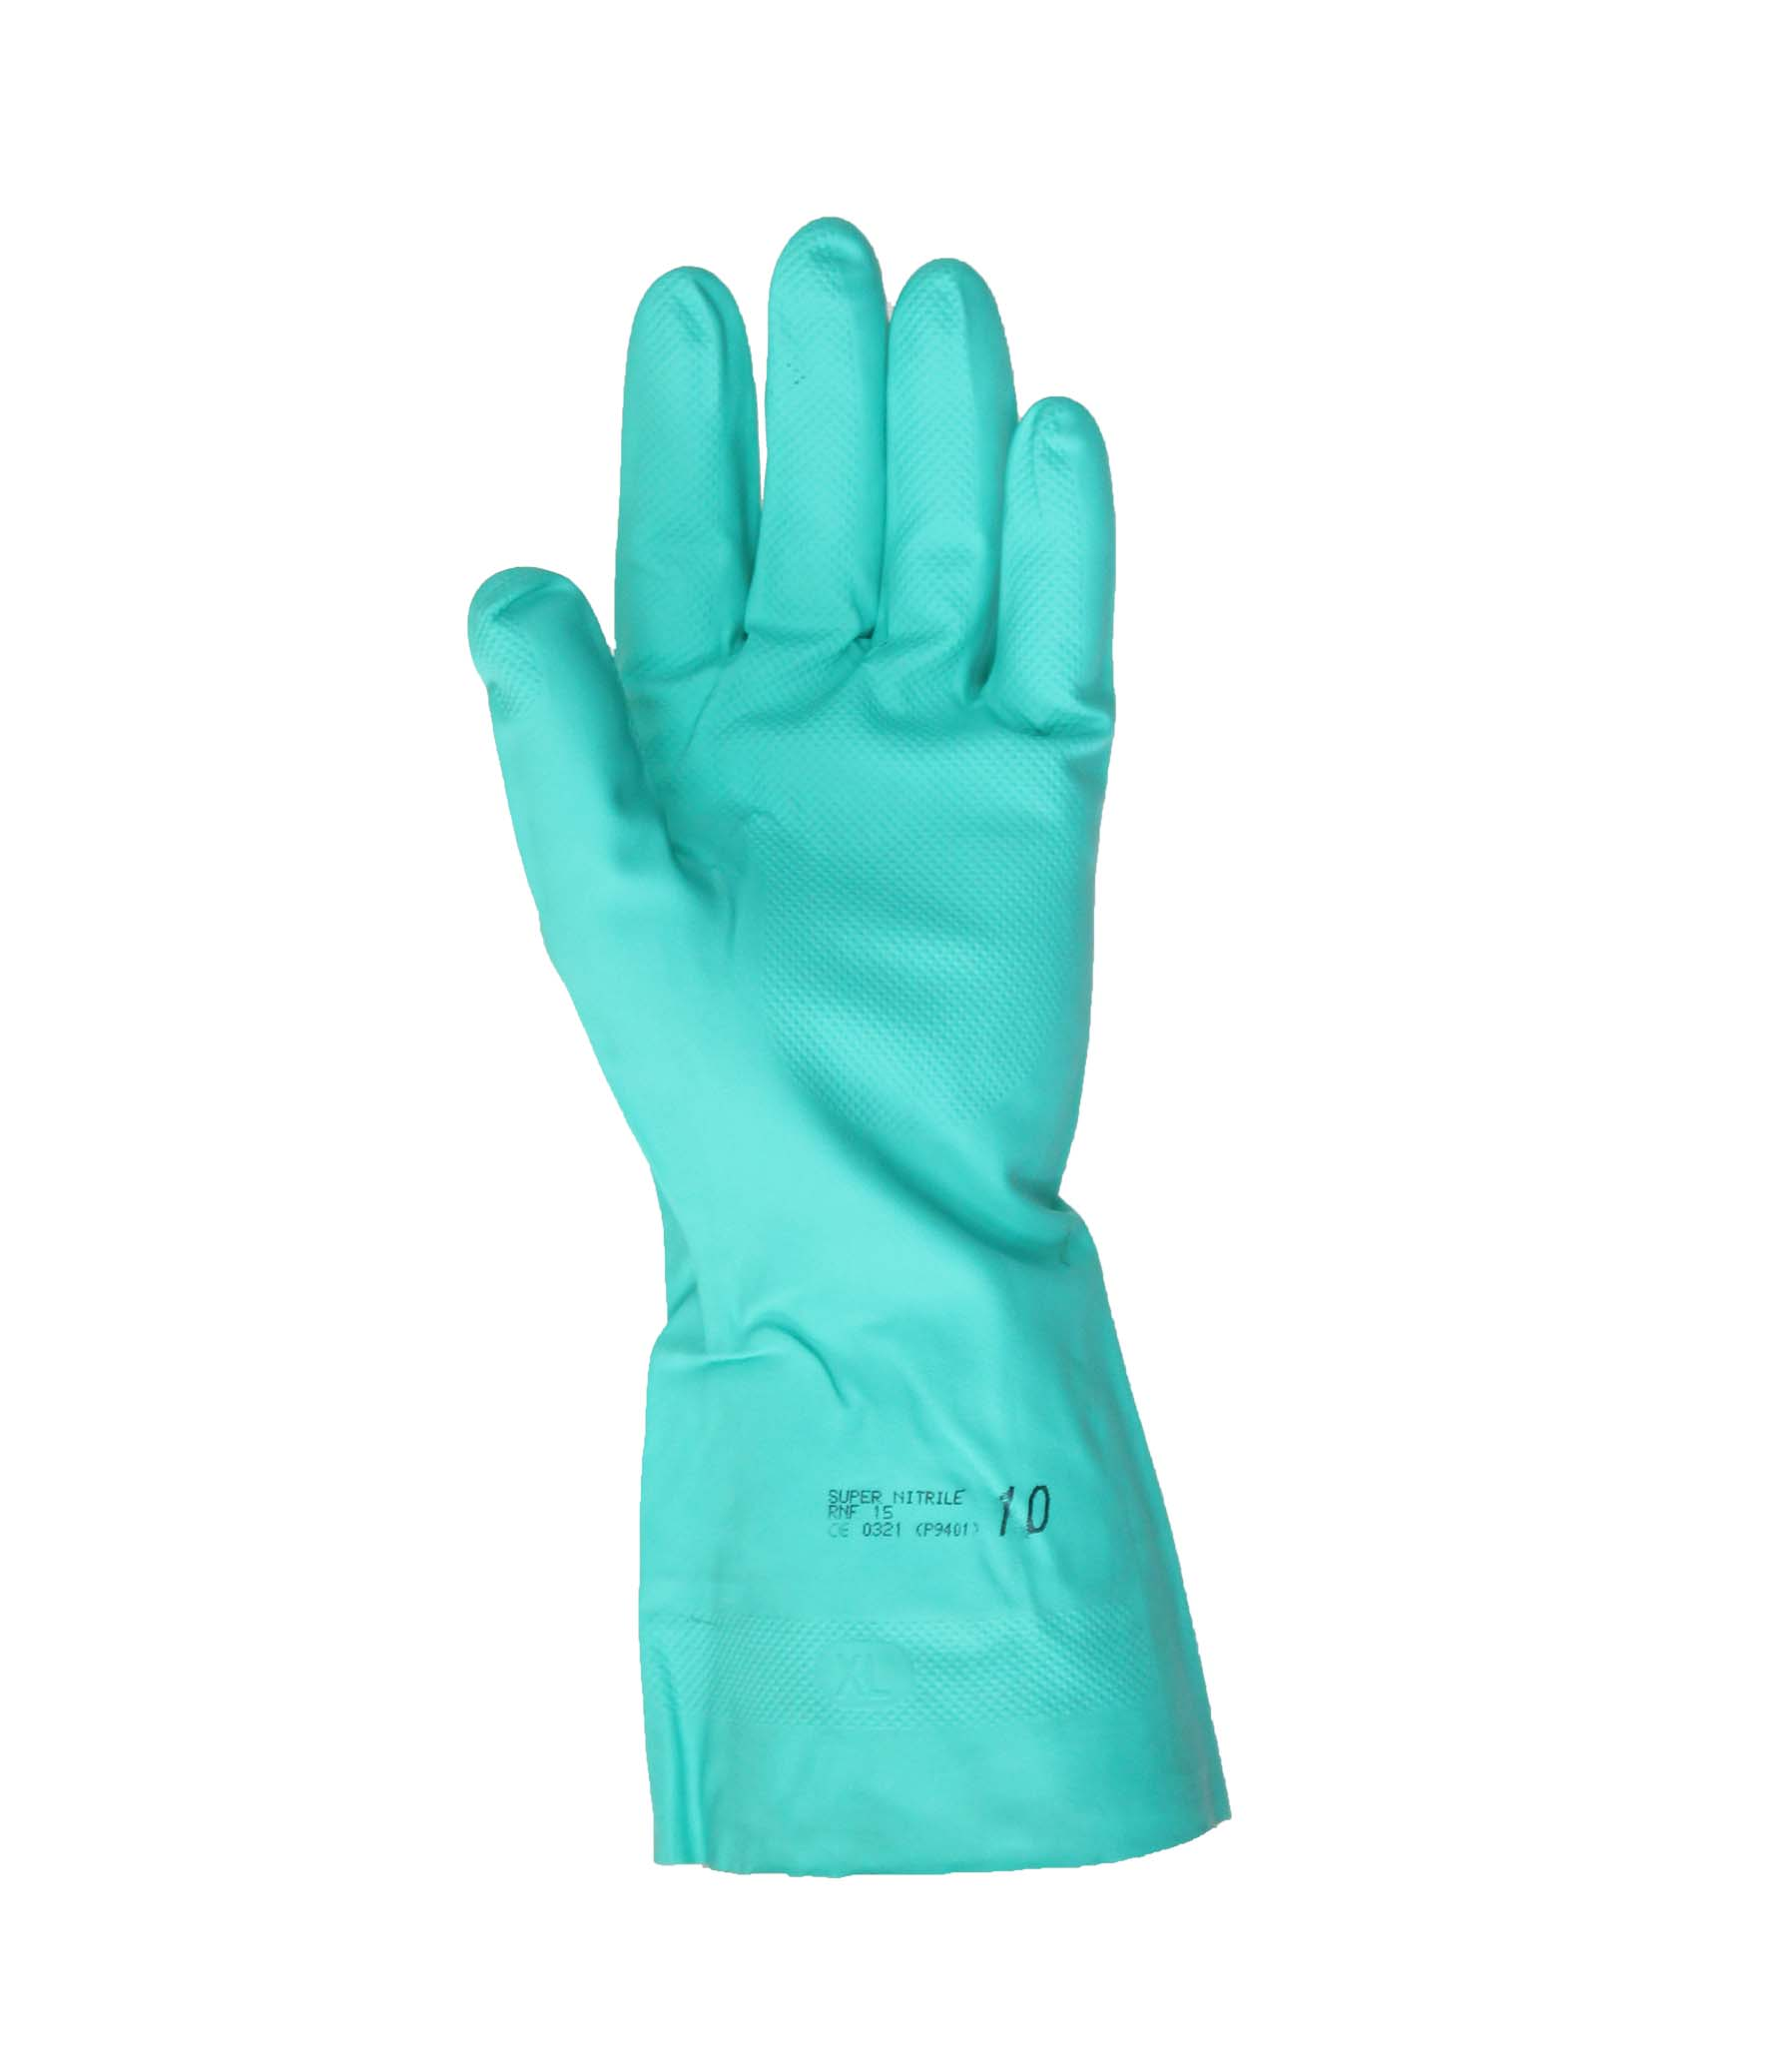 Universal Chemikalien Schutzhandschuhe